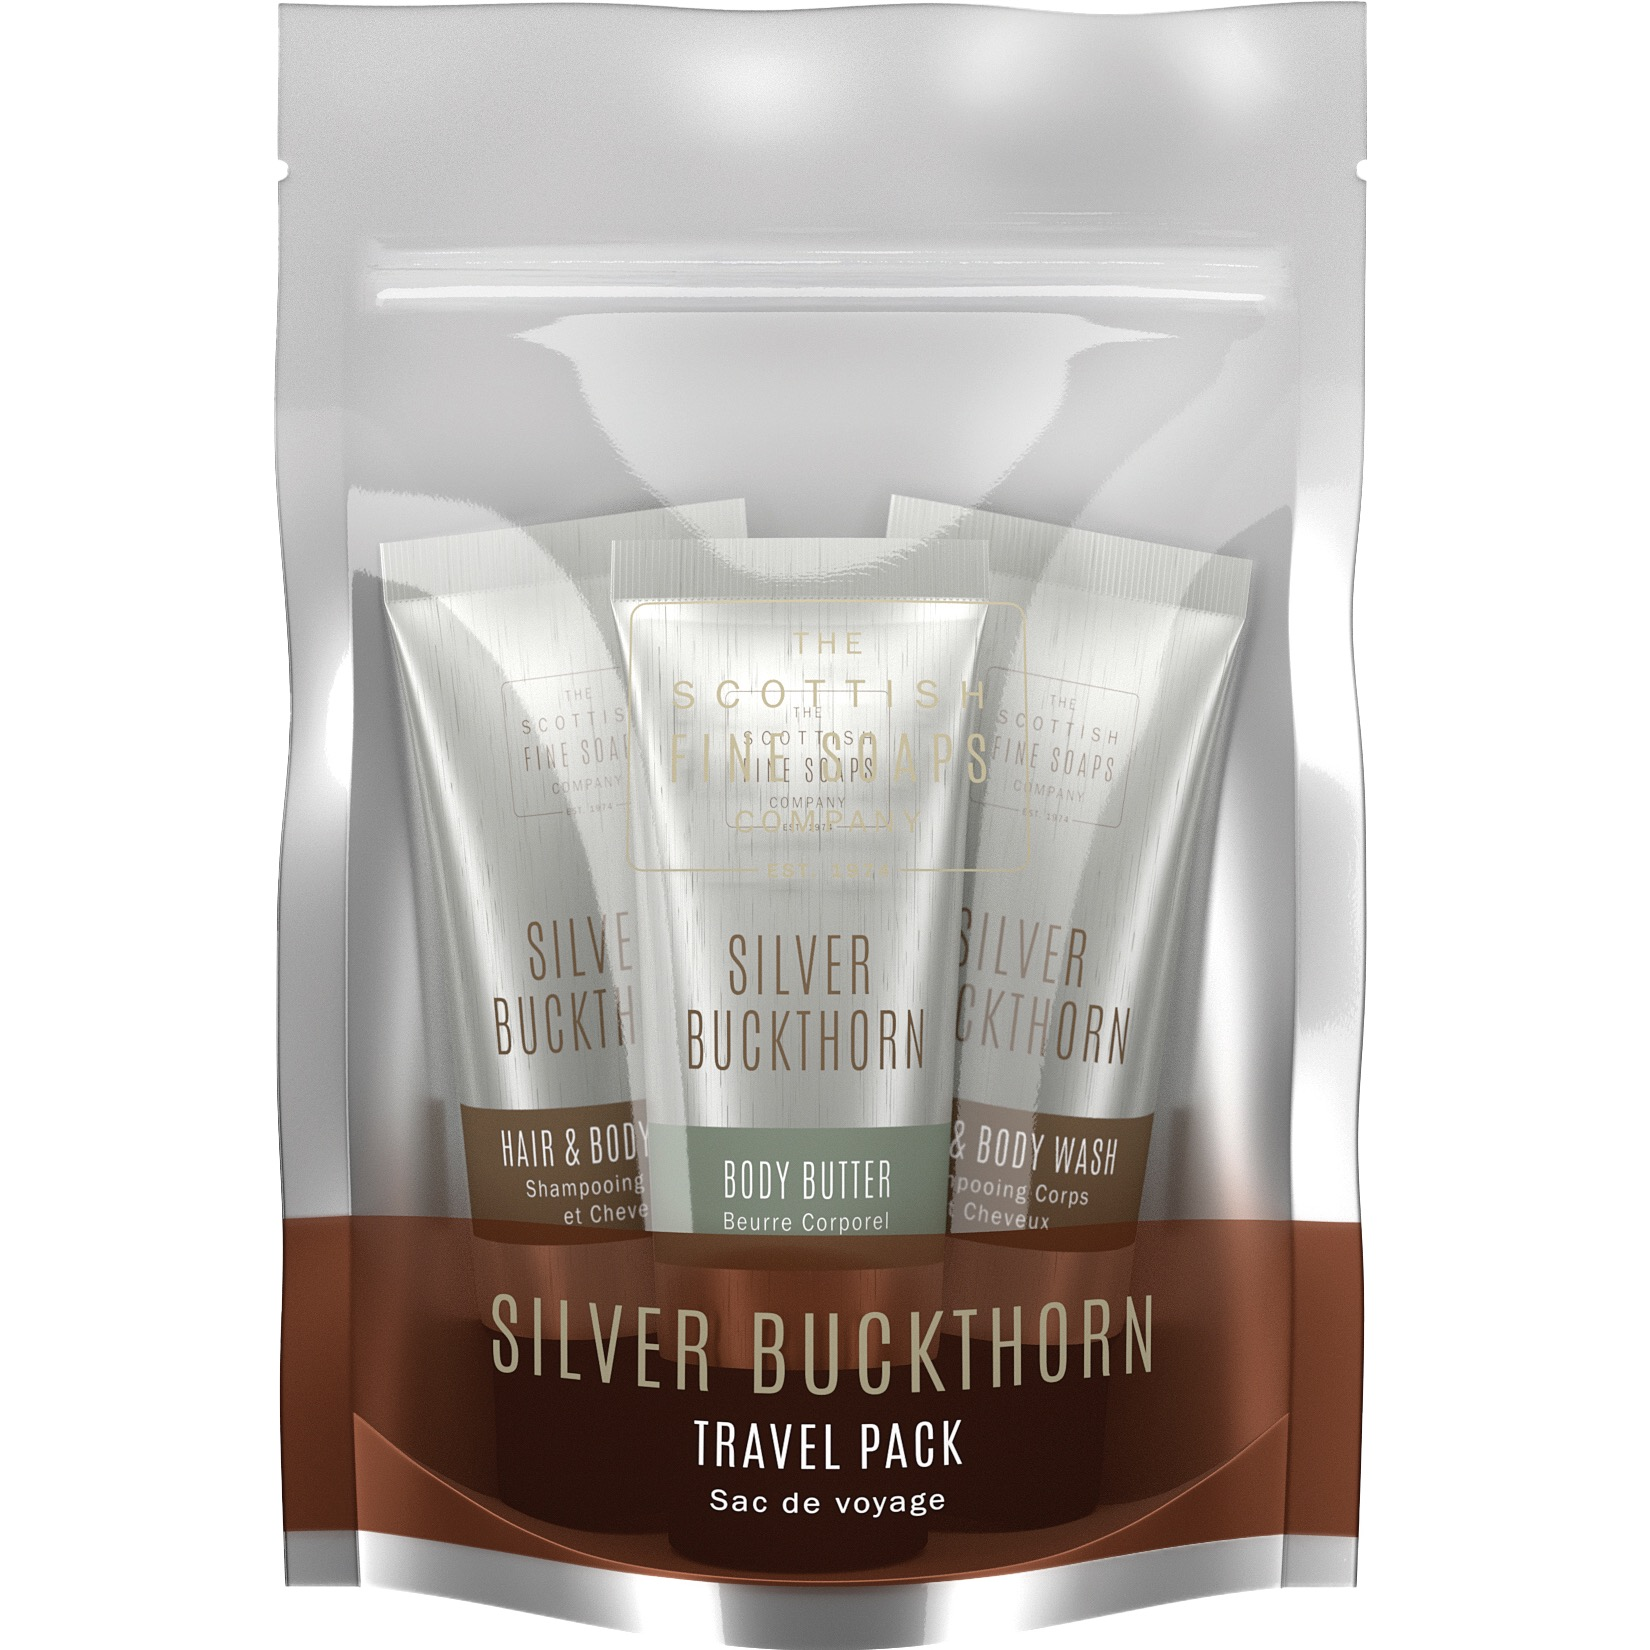 Travel Pack Silver Buckthorn